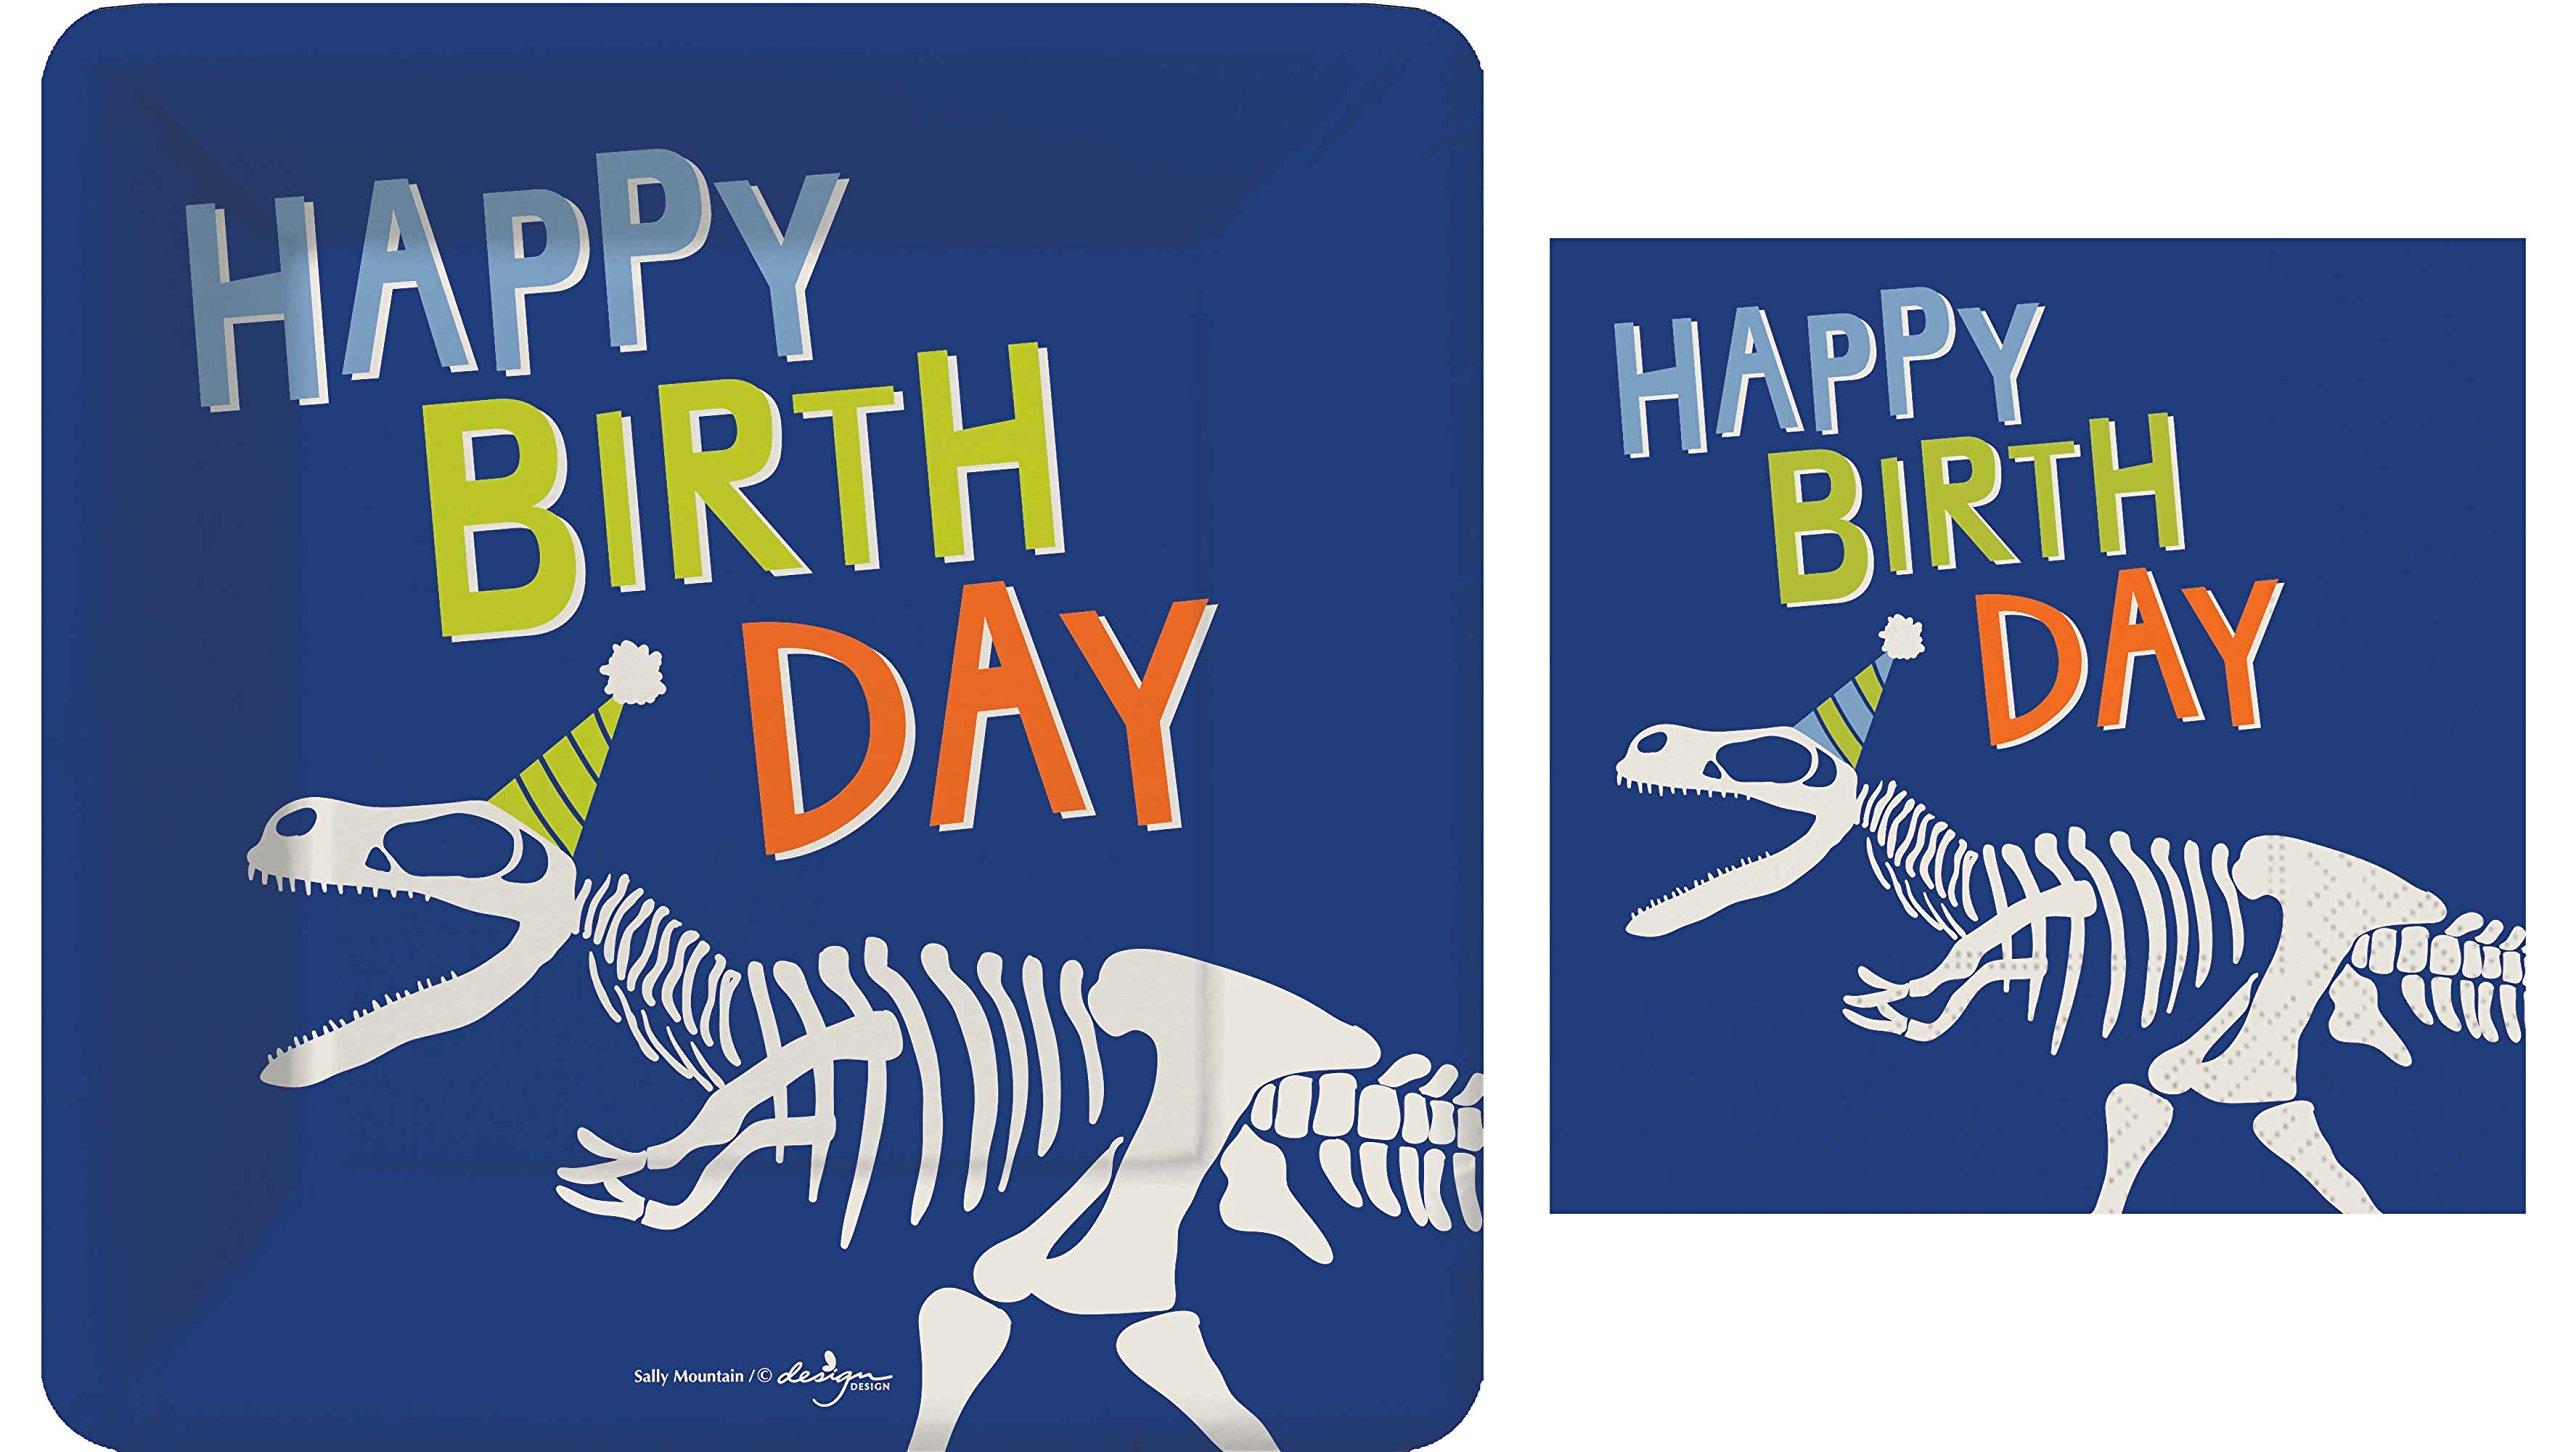 Dinosaur Dino-Mite Small Plates and Napkins By Design Design